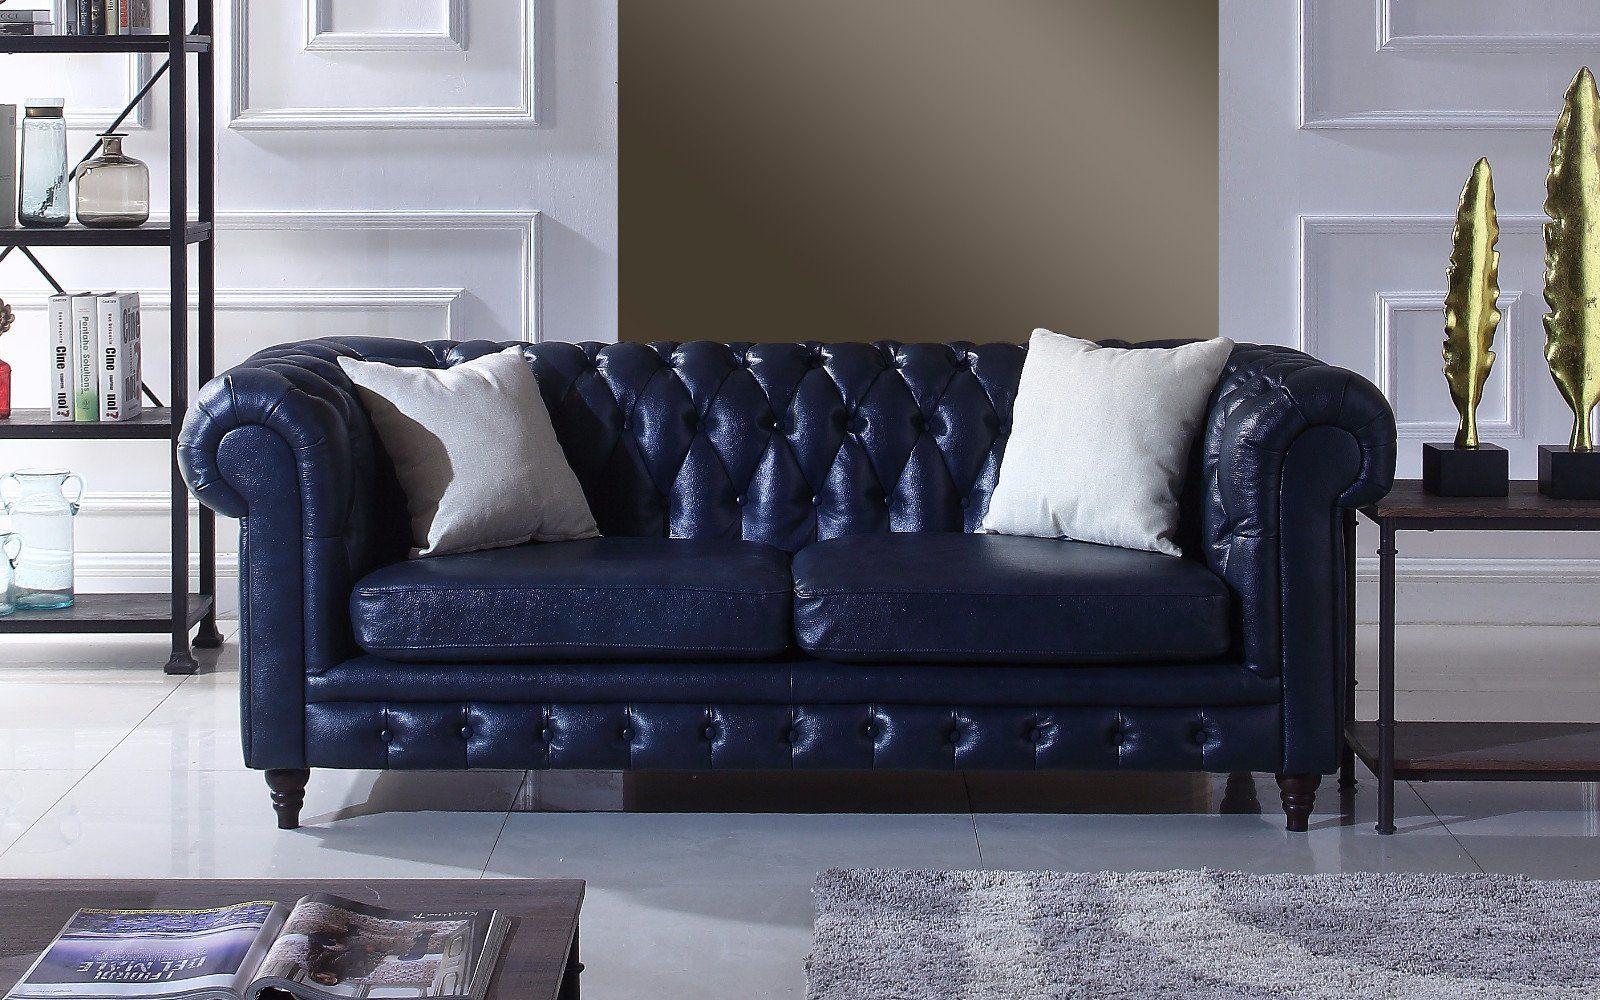 Crawley Leather Chesterfield Sofa Indigo Blue